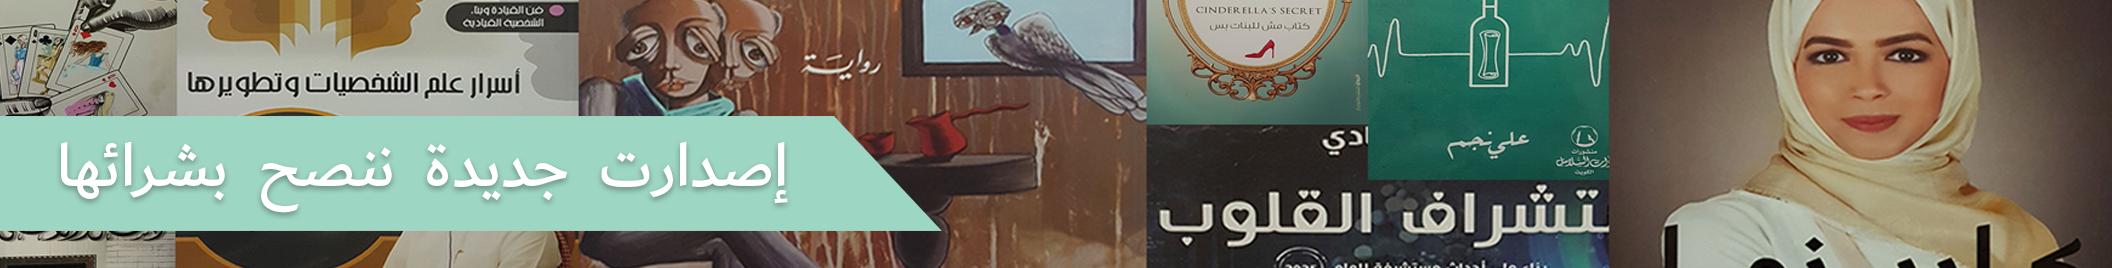 Arabic Books Top Highlights